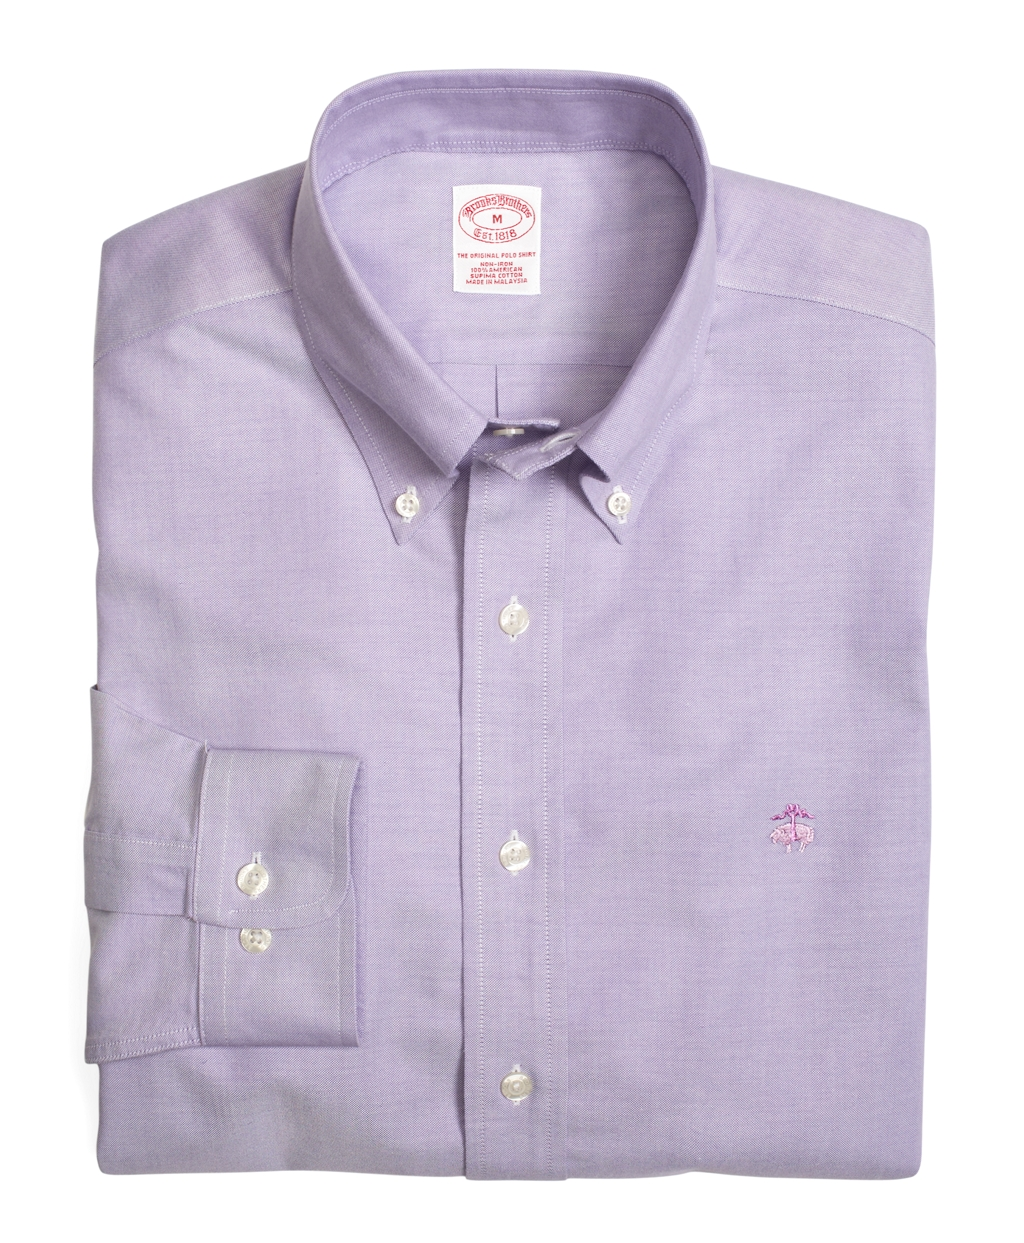 Brooks brothers supima cotton noniron slim fit brookscool for Supima cotton dress shirts